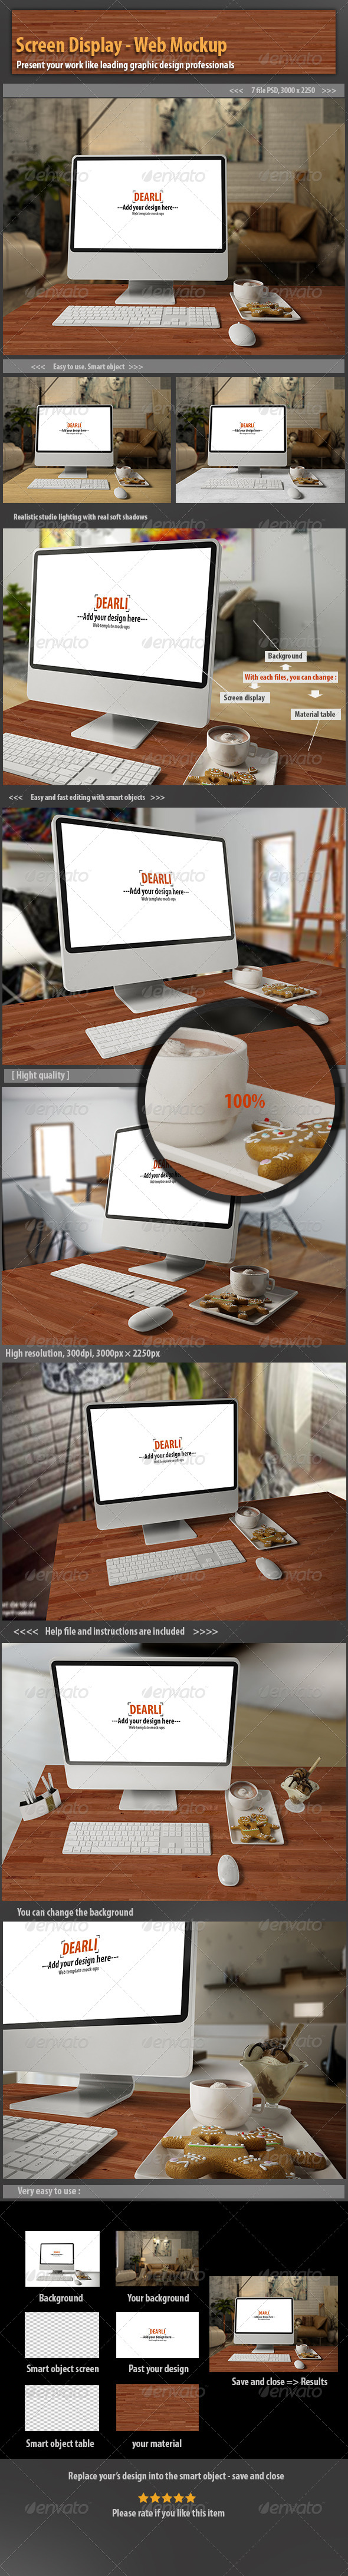 Screen Display- Web Mockup - Displays Product Mock-Ups